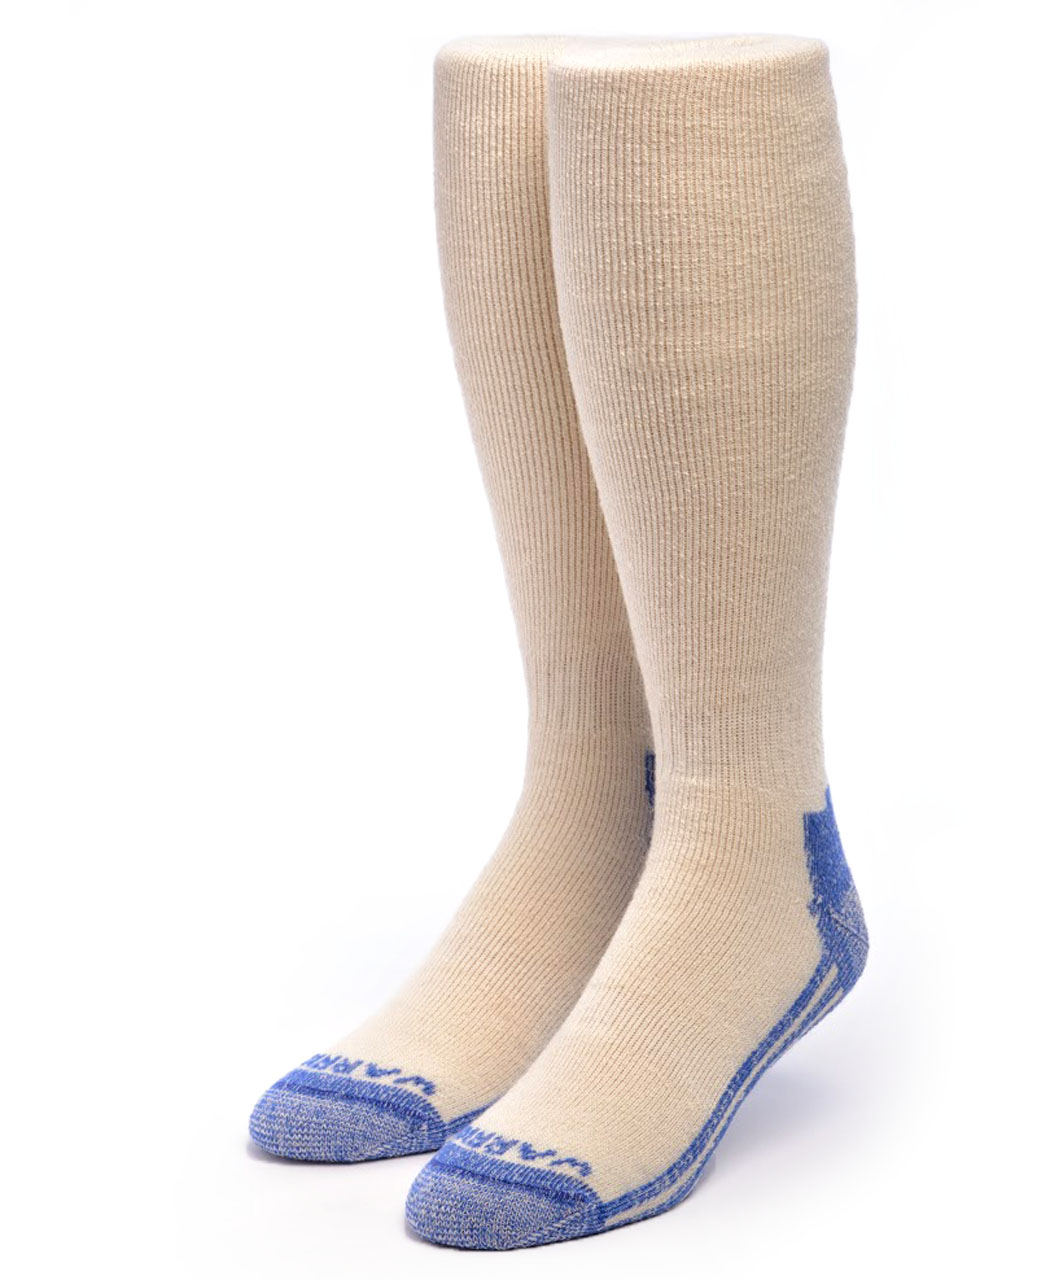 High Performance Knee High Athletic Alpaca Socks Front White